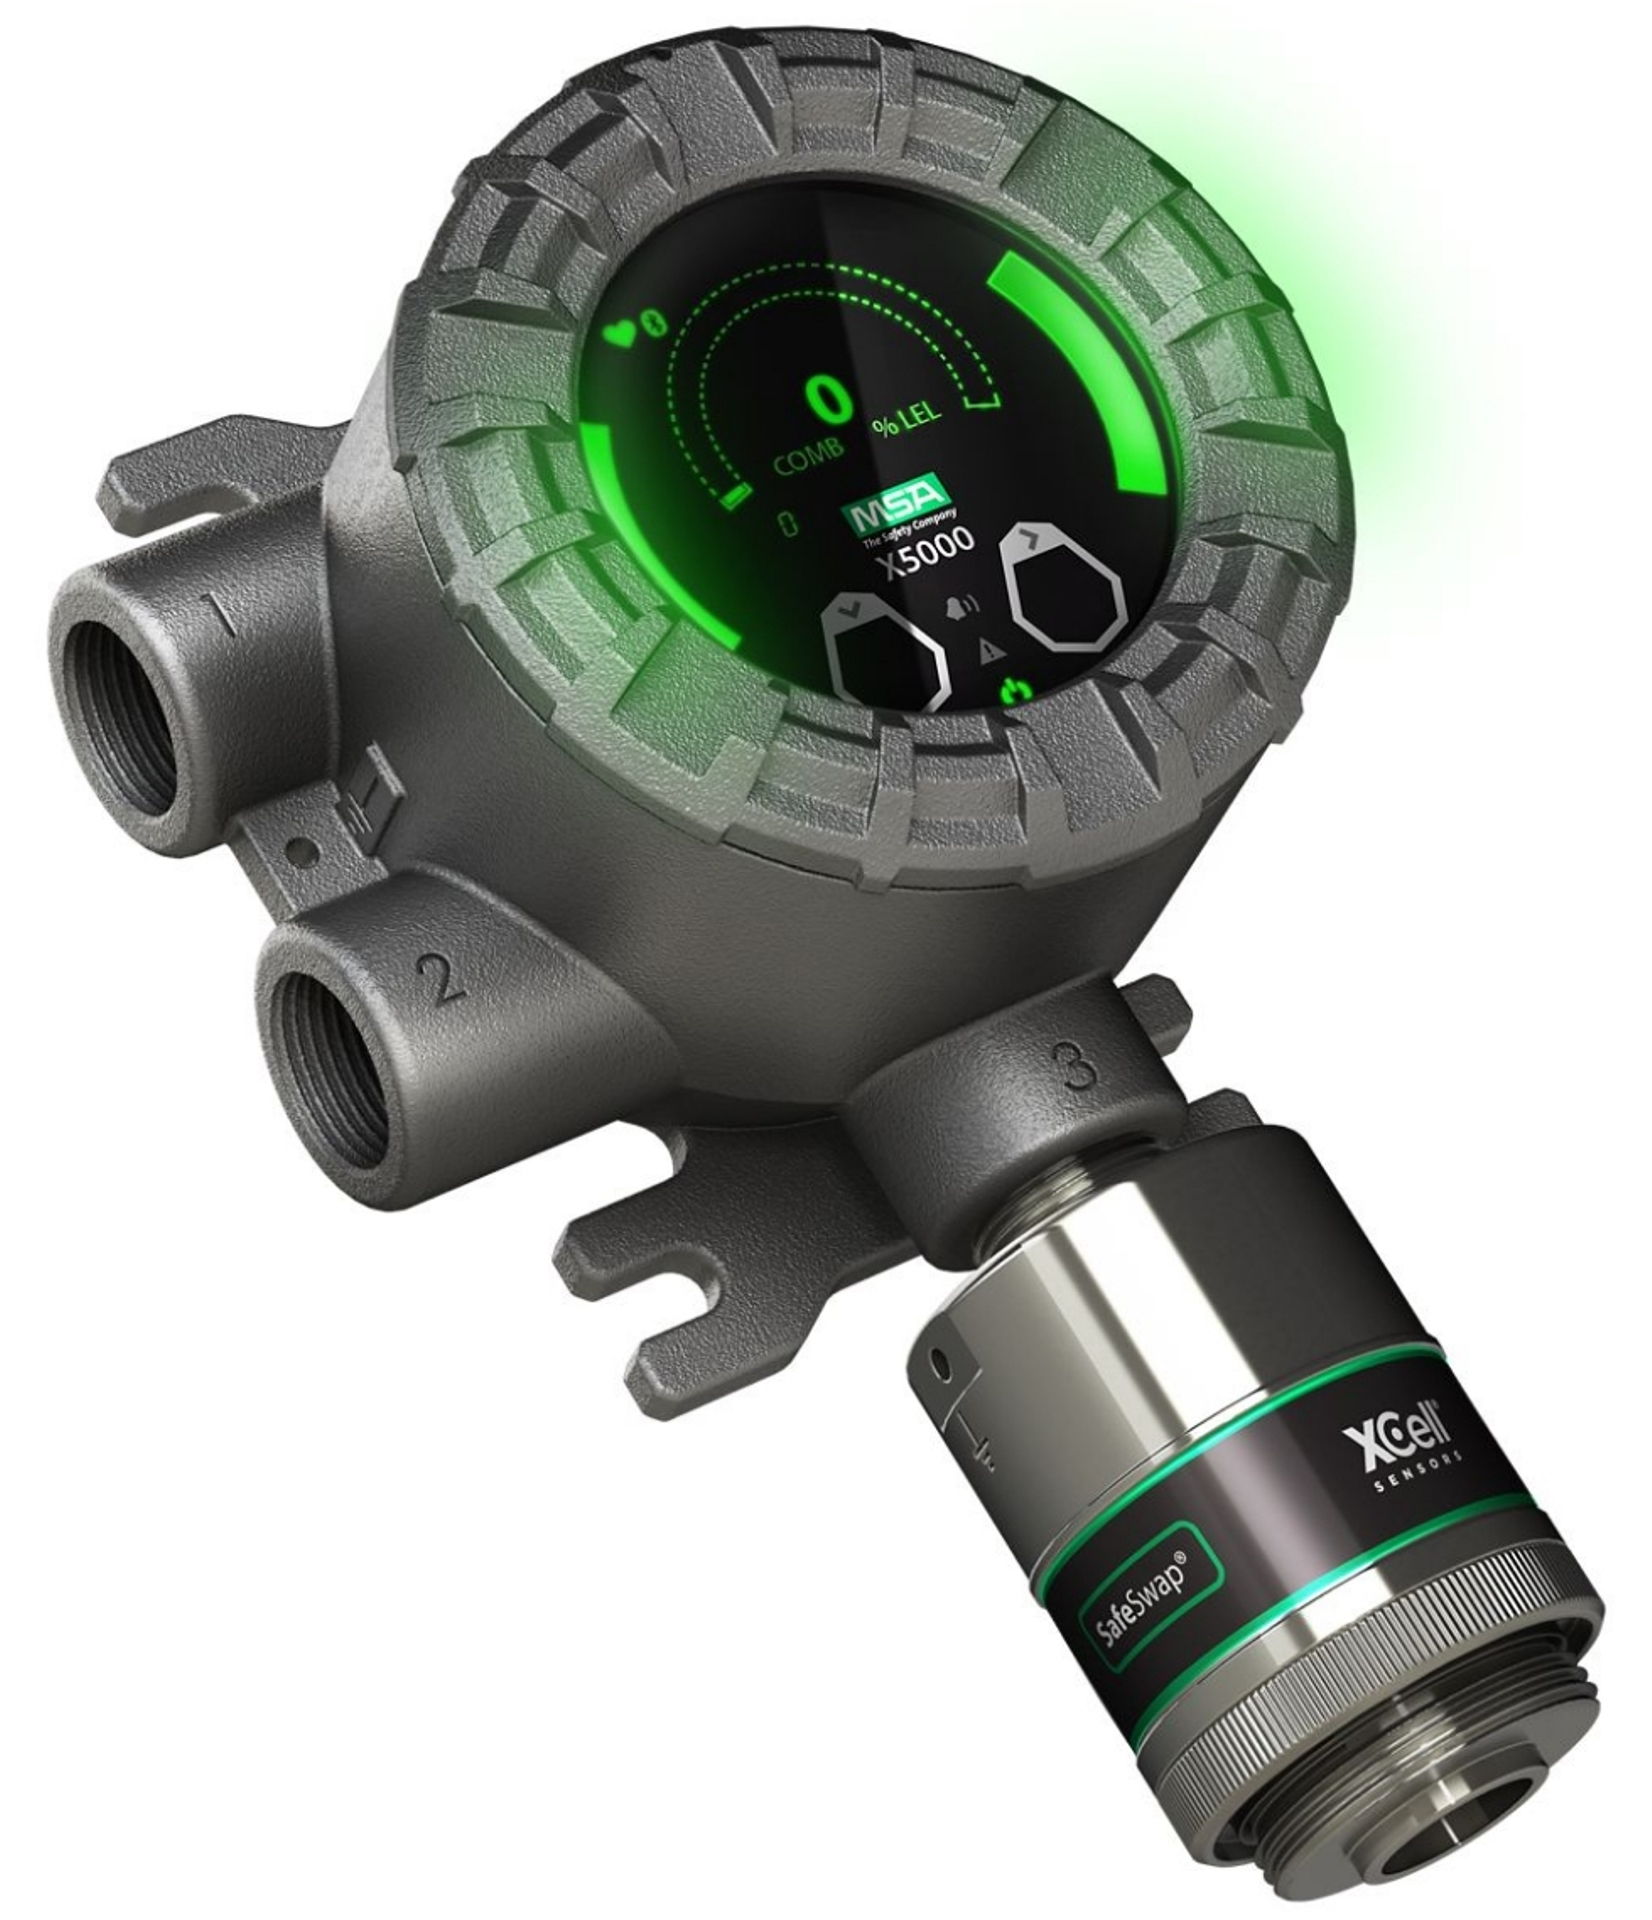 Gassdetektor Gas detector Transmitter Gas leak detector Gasslekkasje gassmler gassalarm portable portabel MSA Safety Ultima X5000